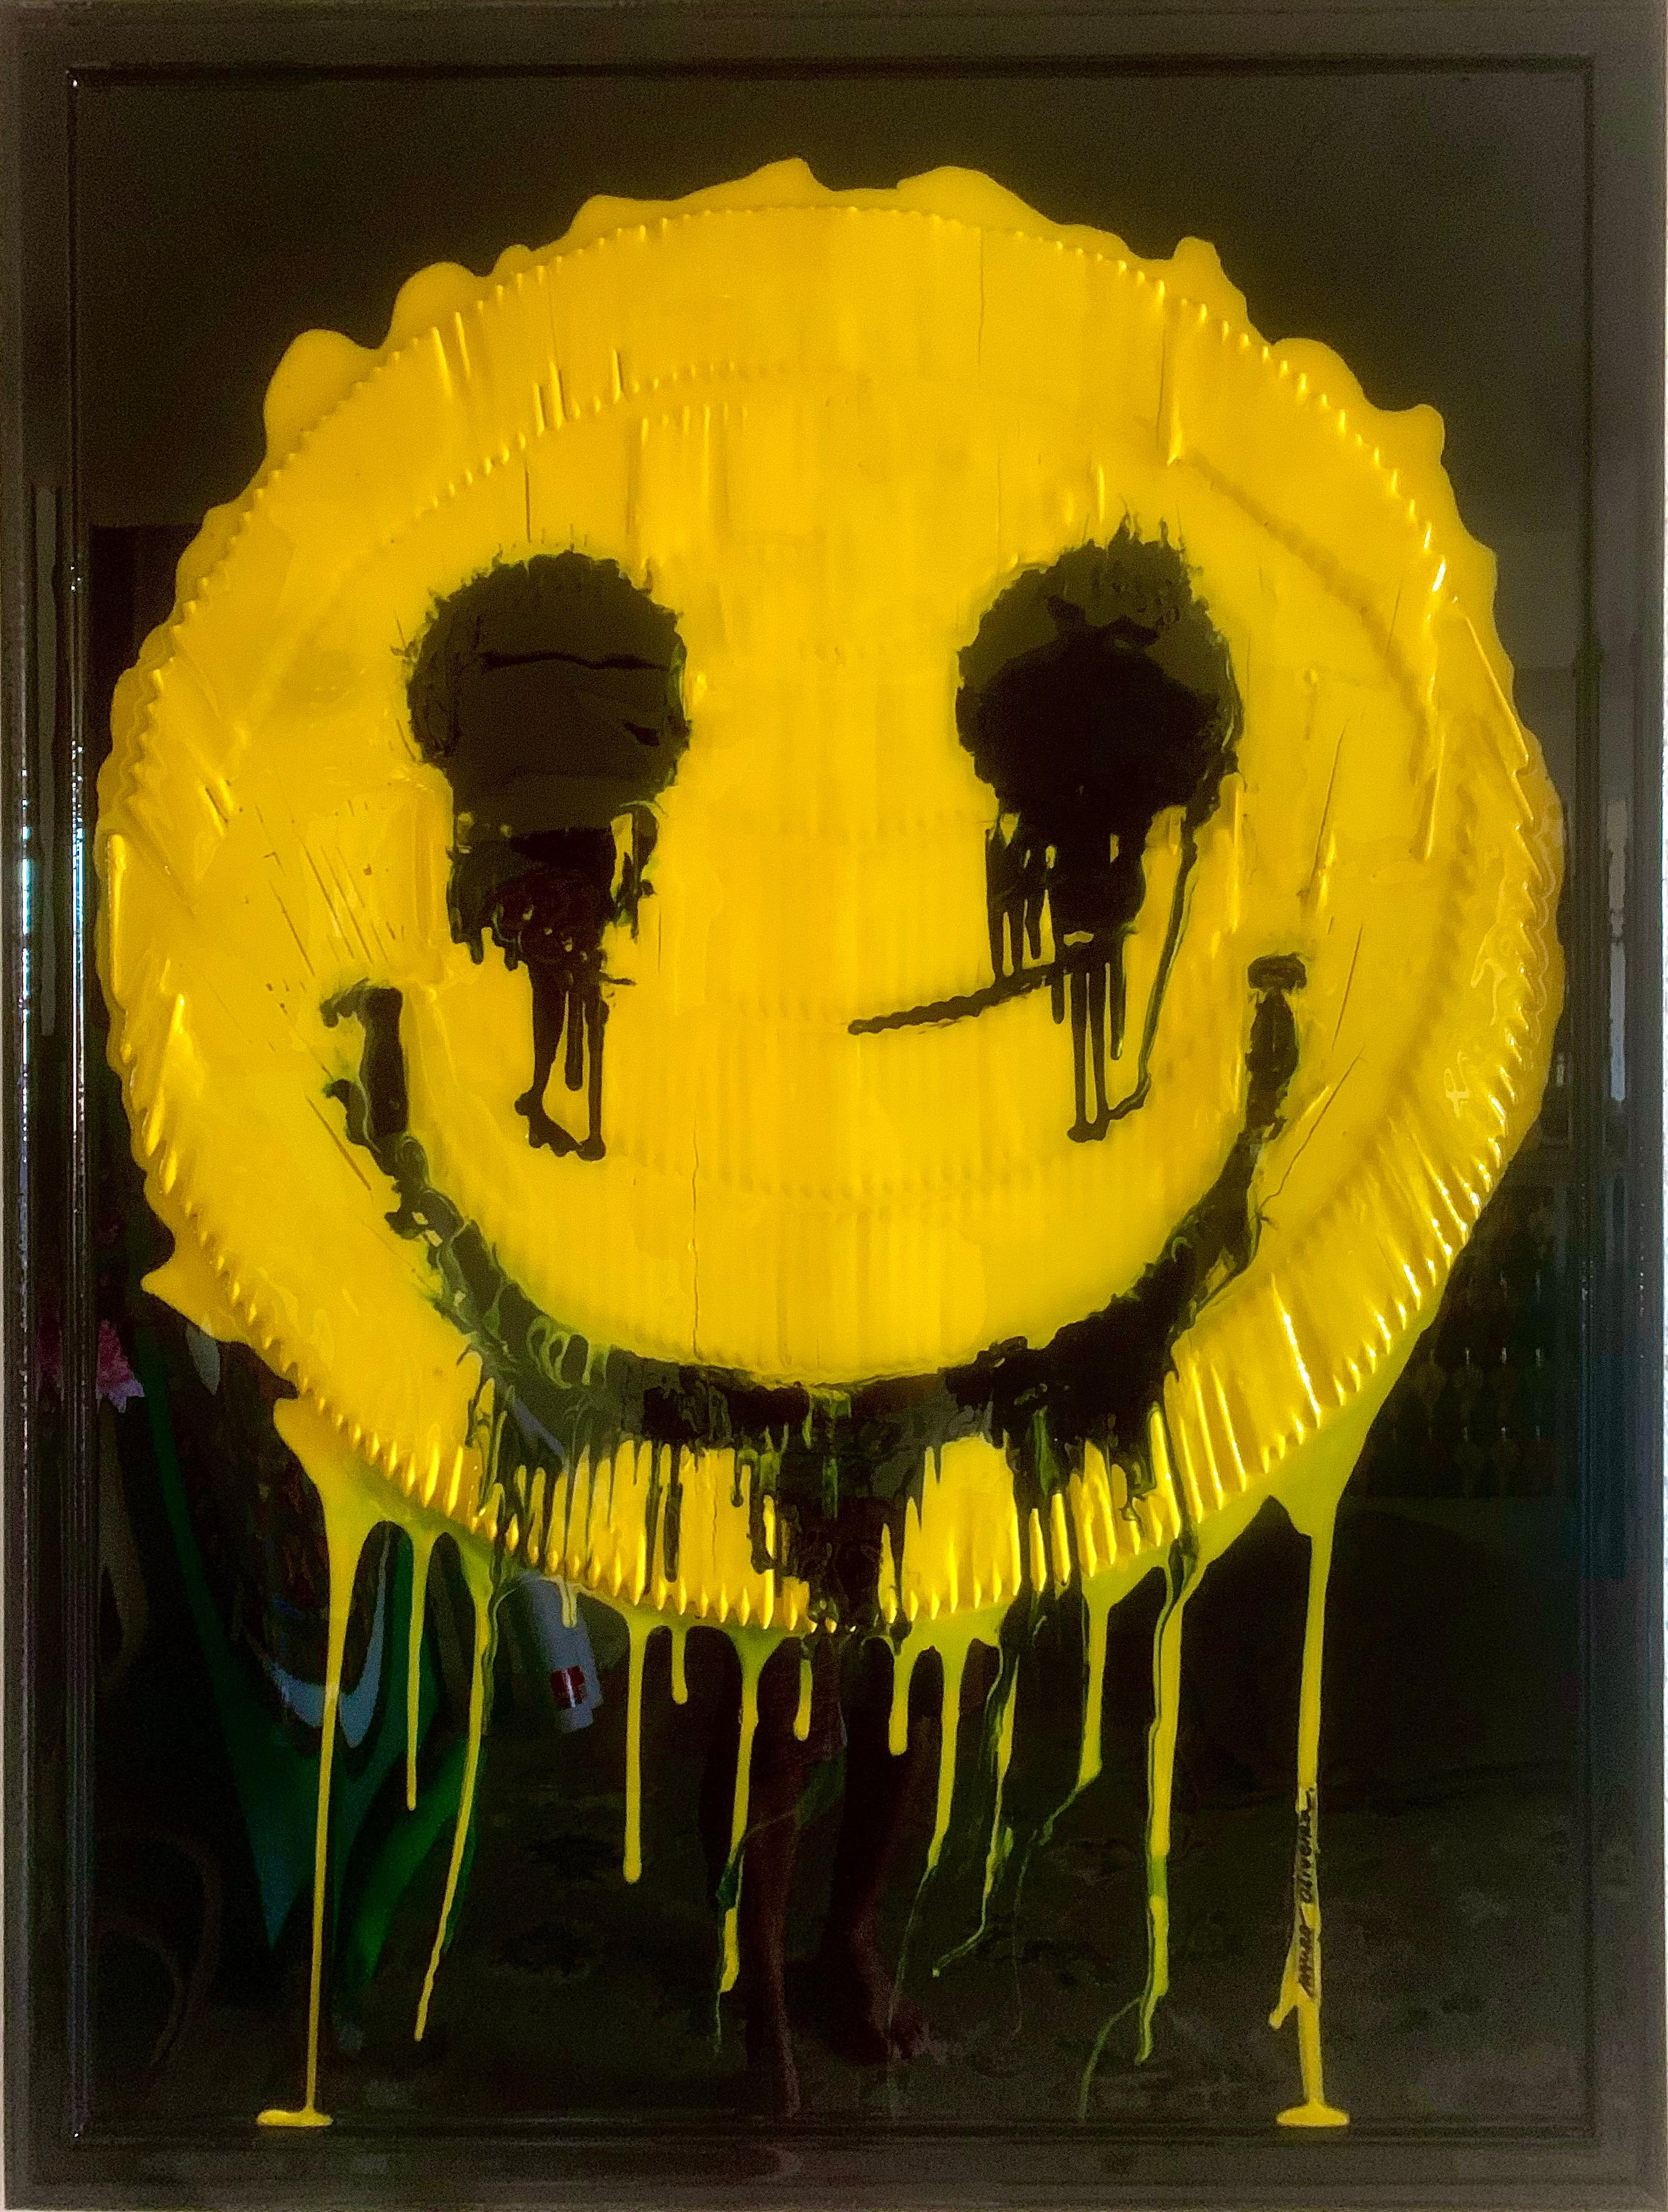 MELTING HAPPINESS (Original Mixed Media Framed Artwork)